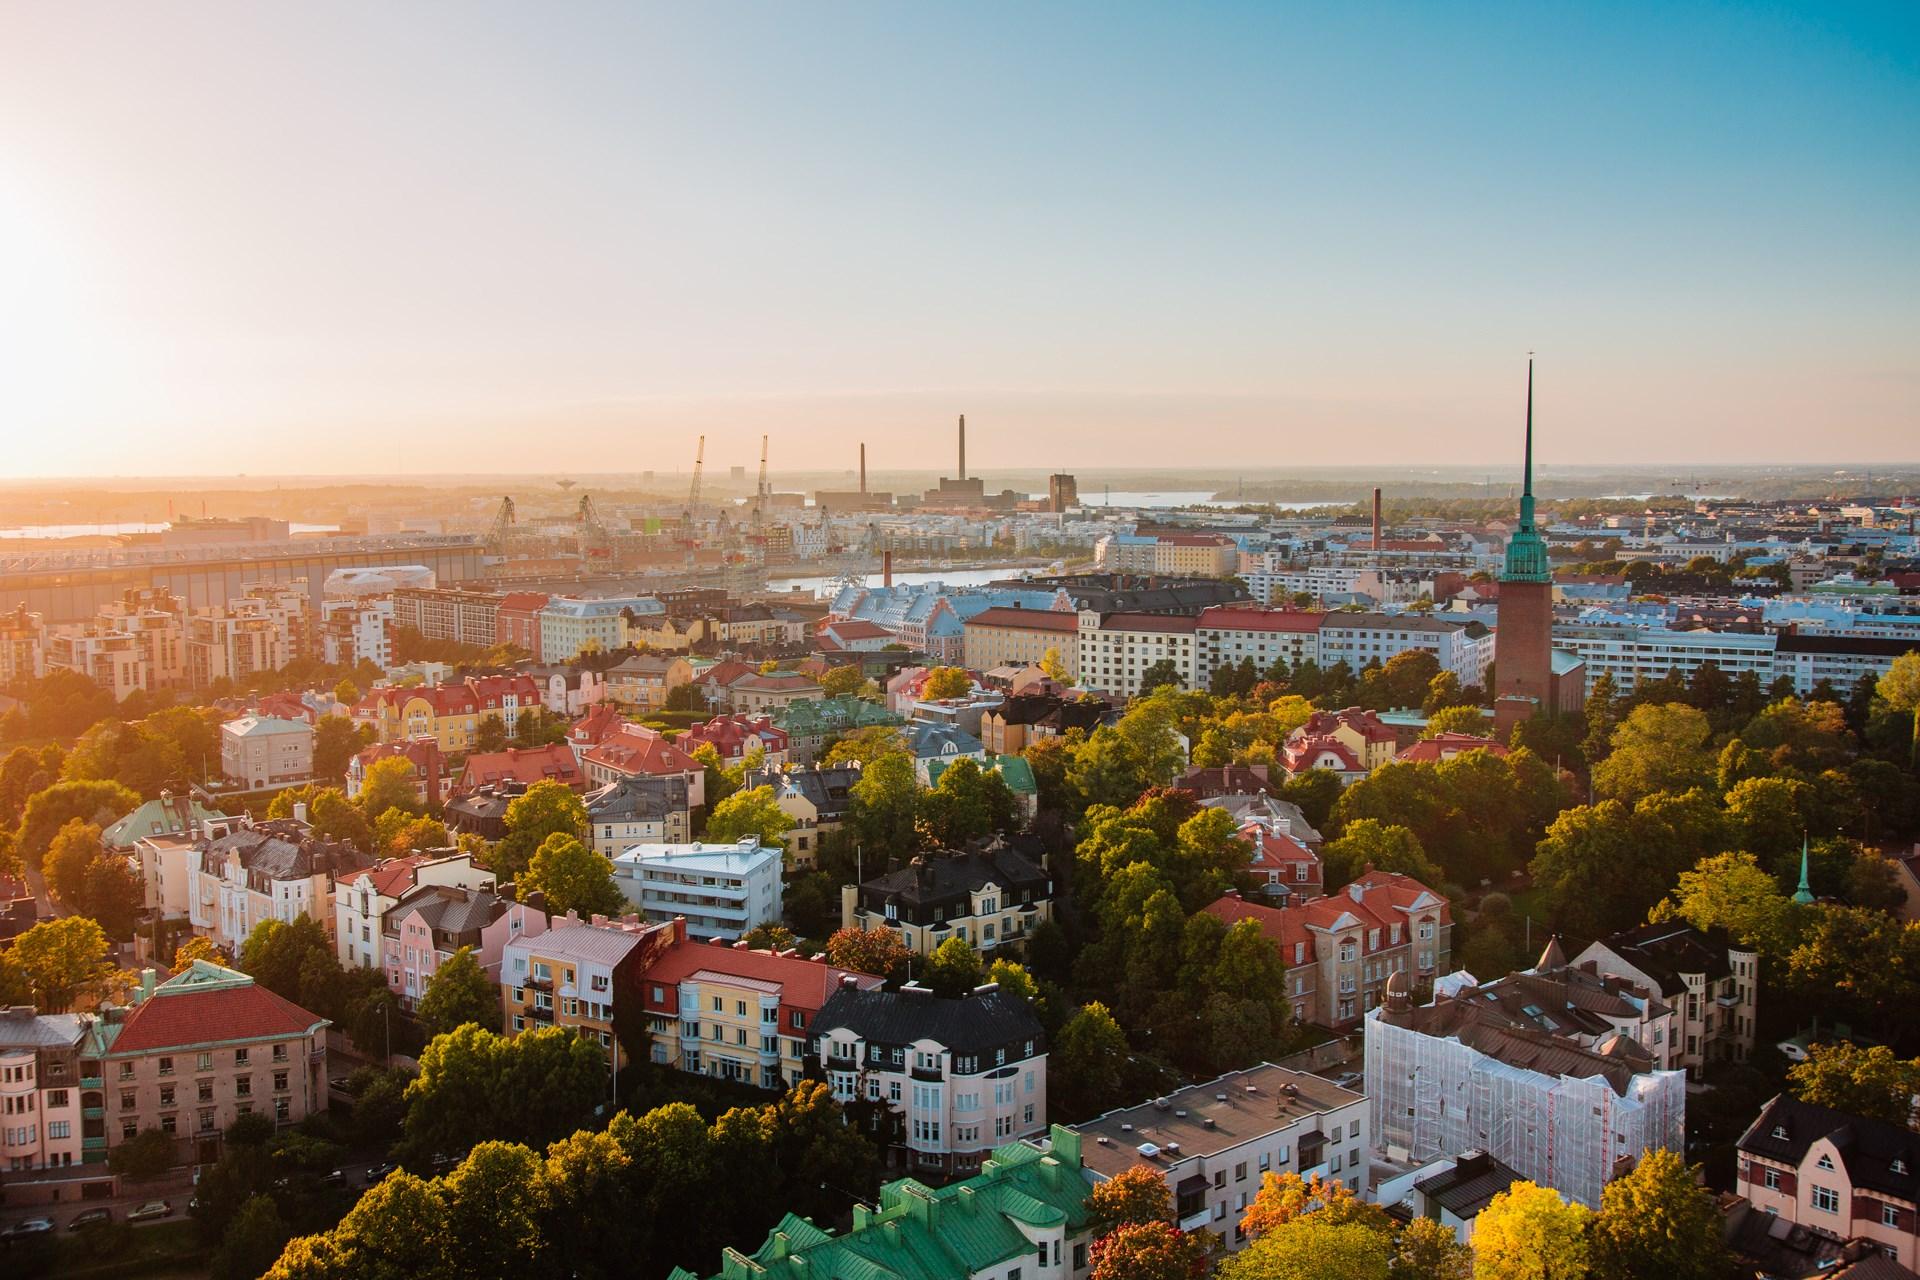 aerial-view-of-Helsinki-finland-conde-nast-traveller-18march16-visit-helsinki-Jussi-Hellsten